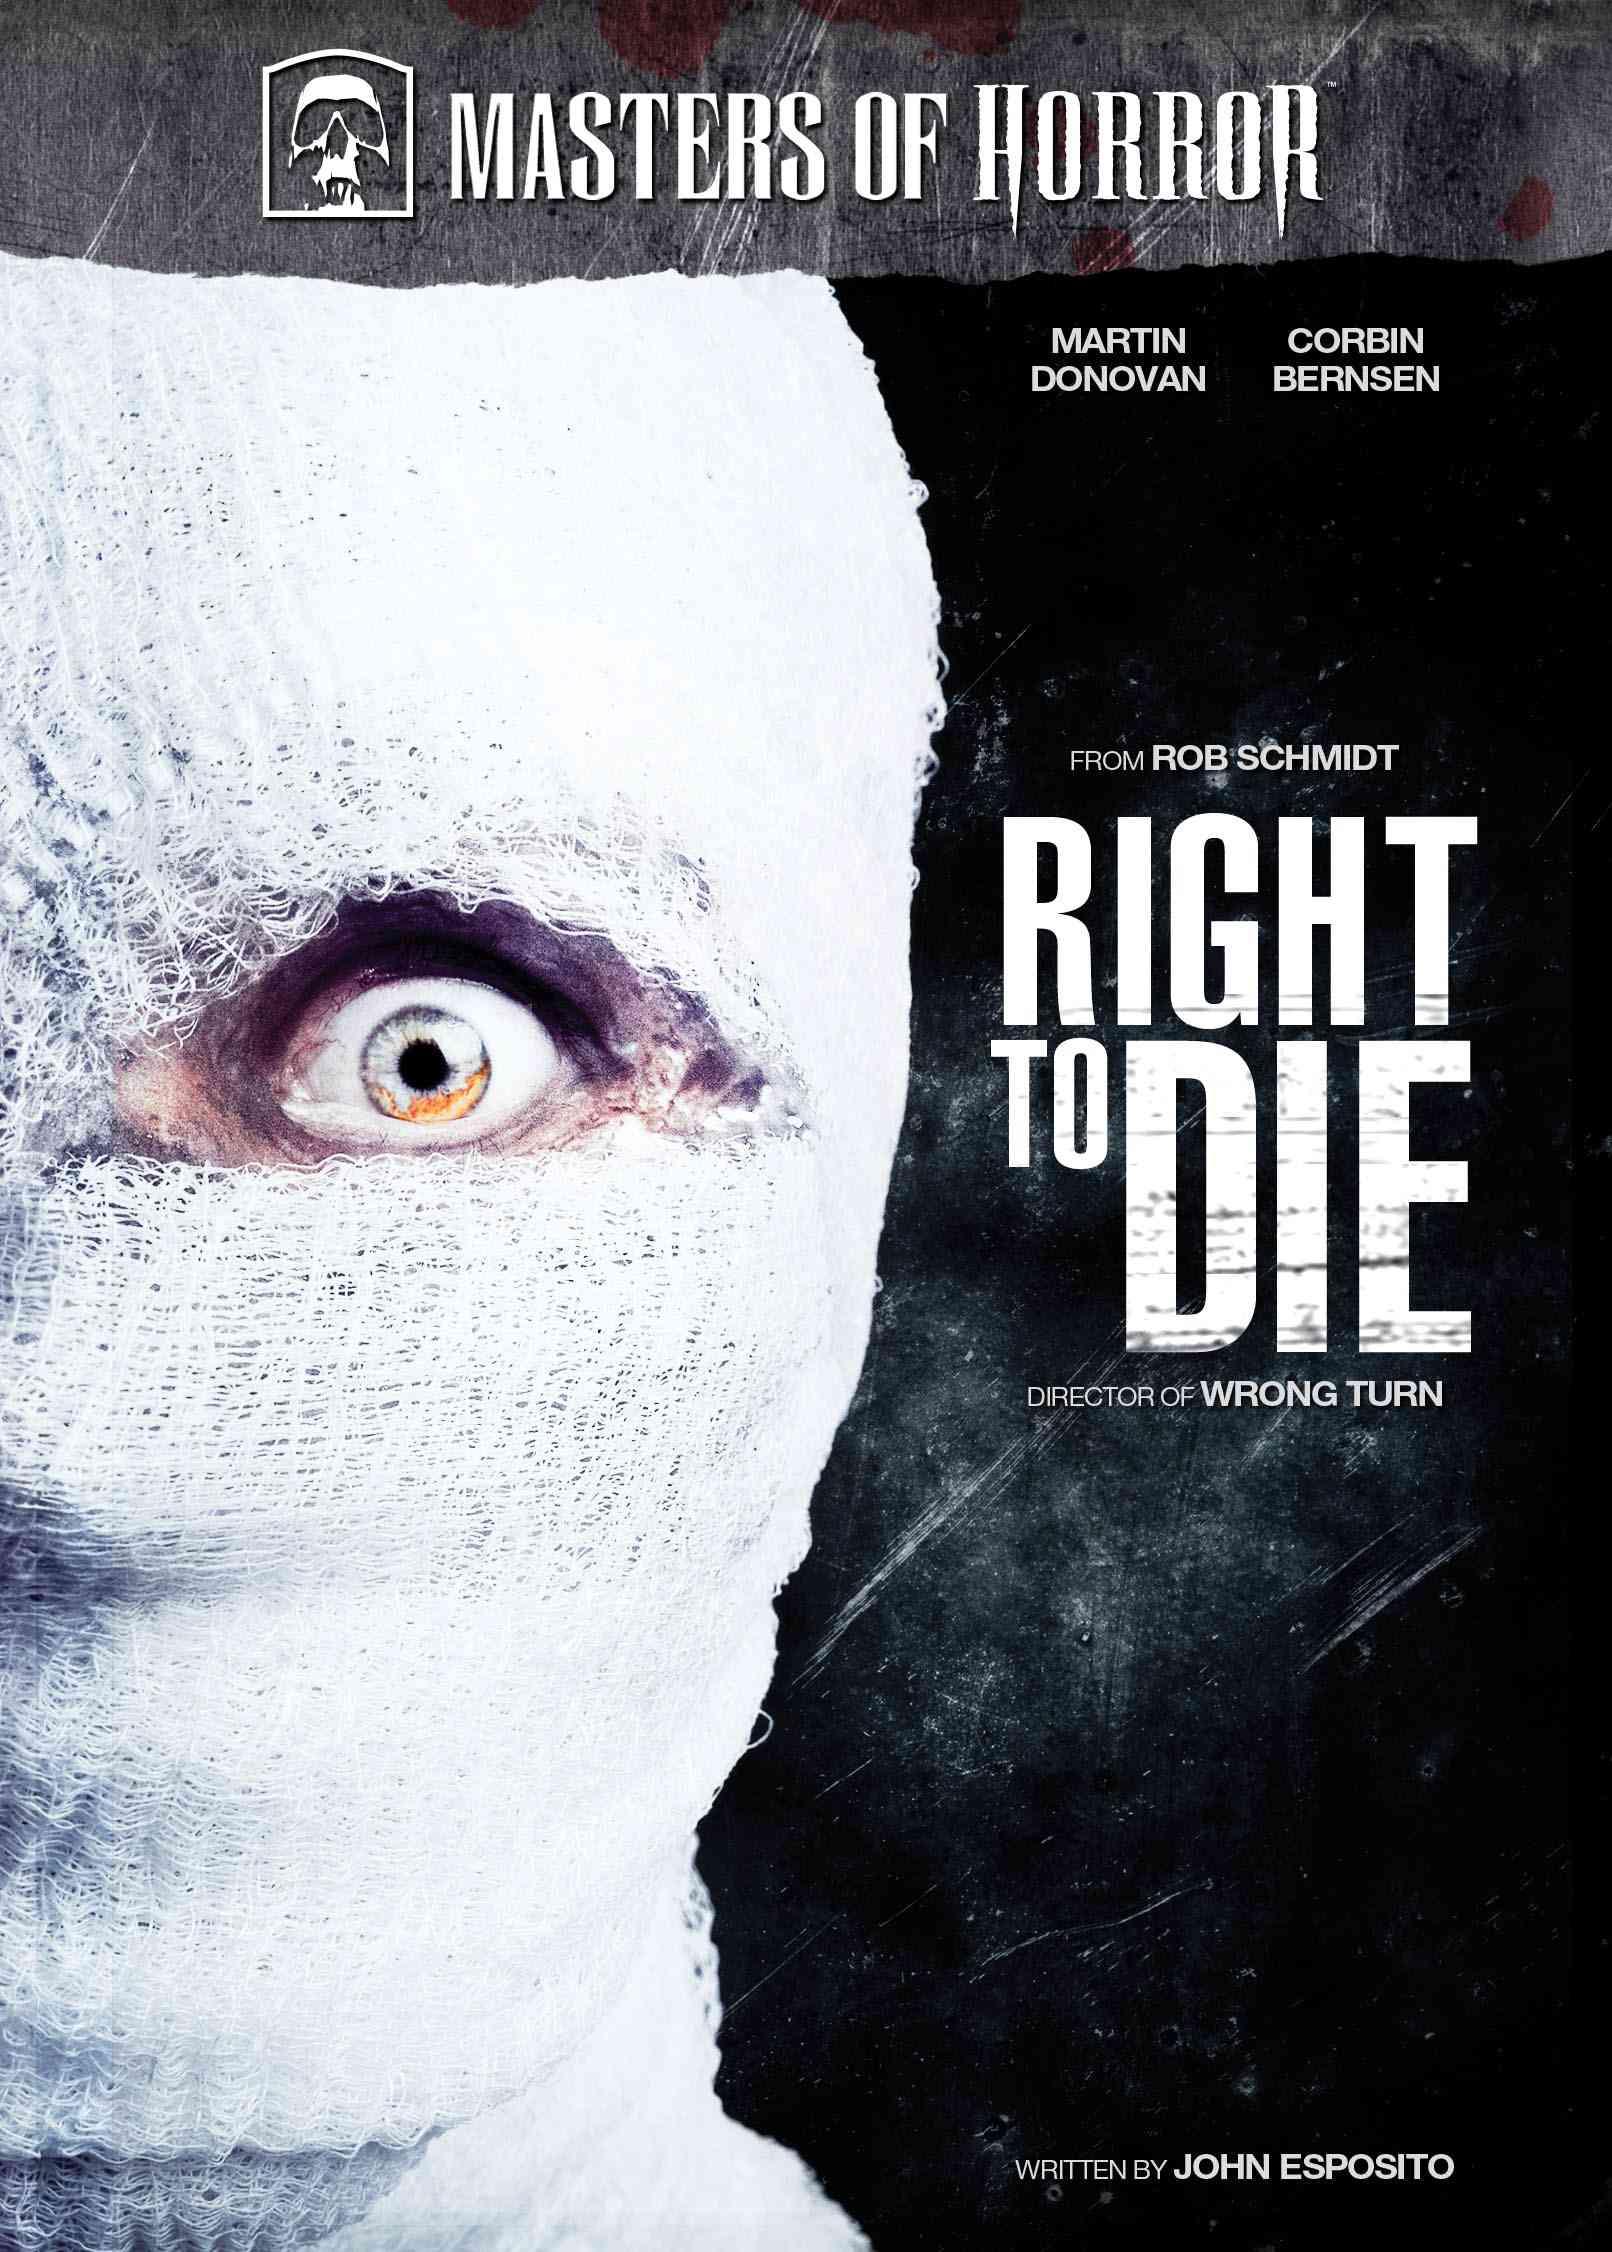 MASTER OF HORROR:RIGHT TO DIE BY AUSTIN,KAREN (DVD)